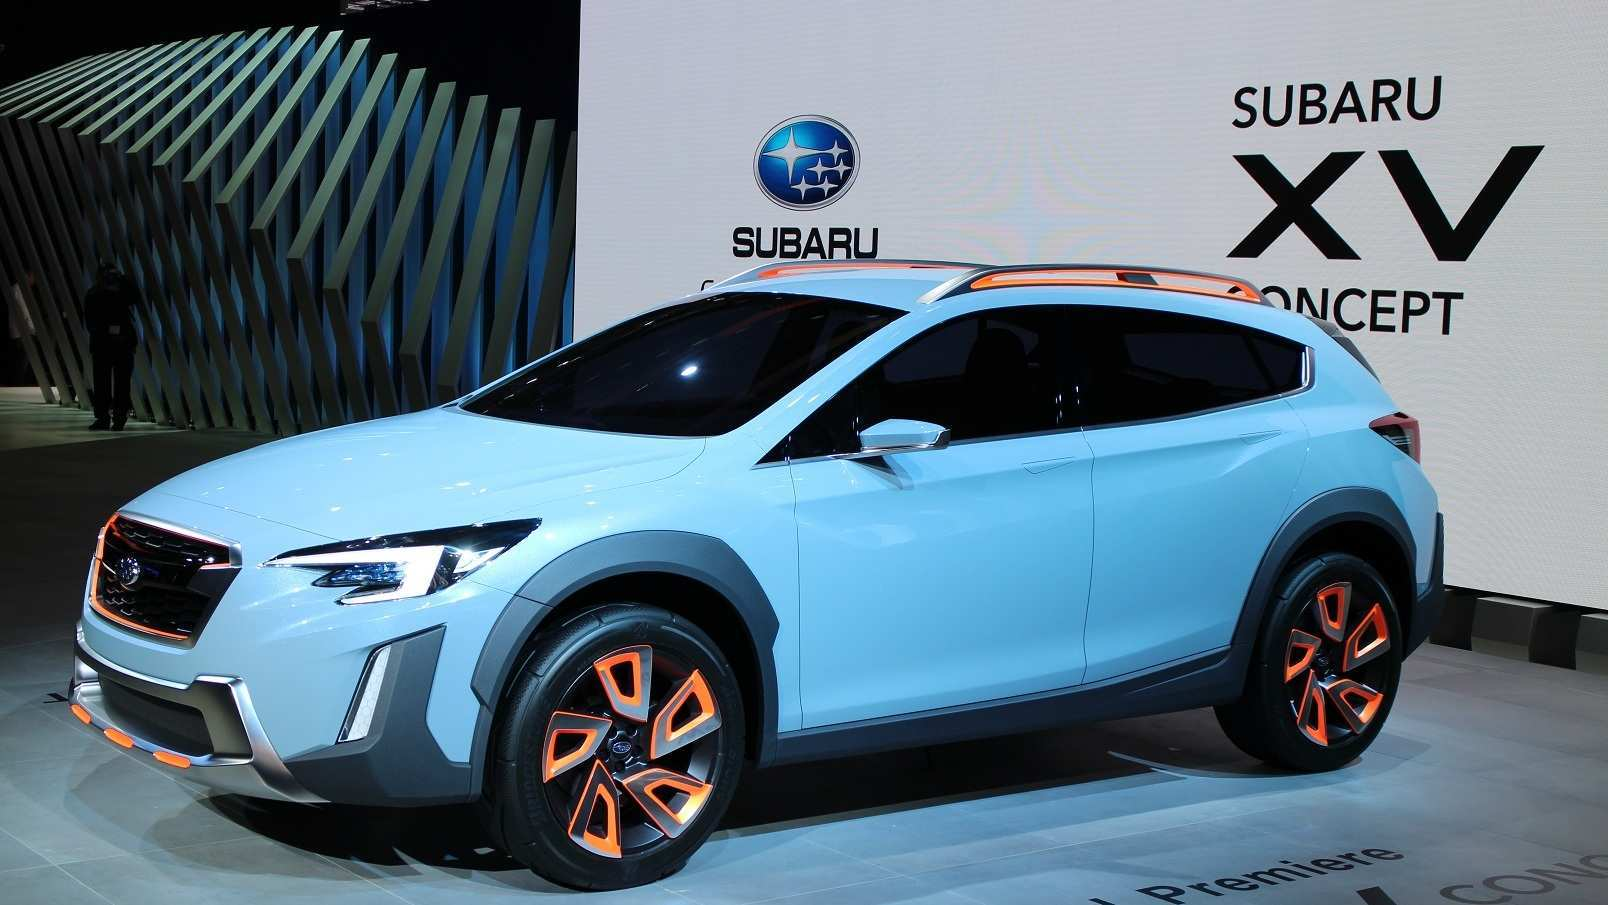 82 All New Subaru Xv 2020 New Concept Photos with Subaru Xv 2020 New Concept